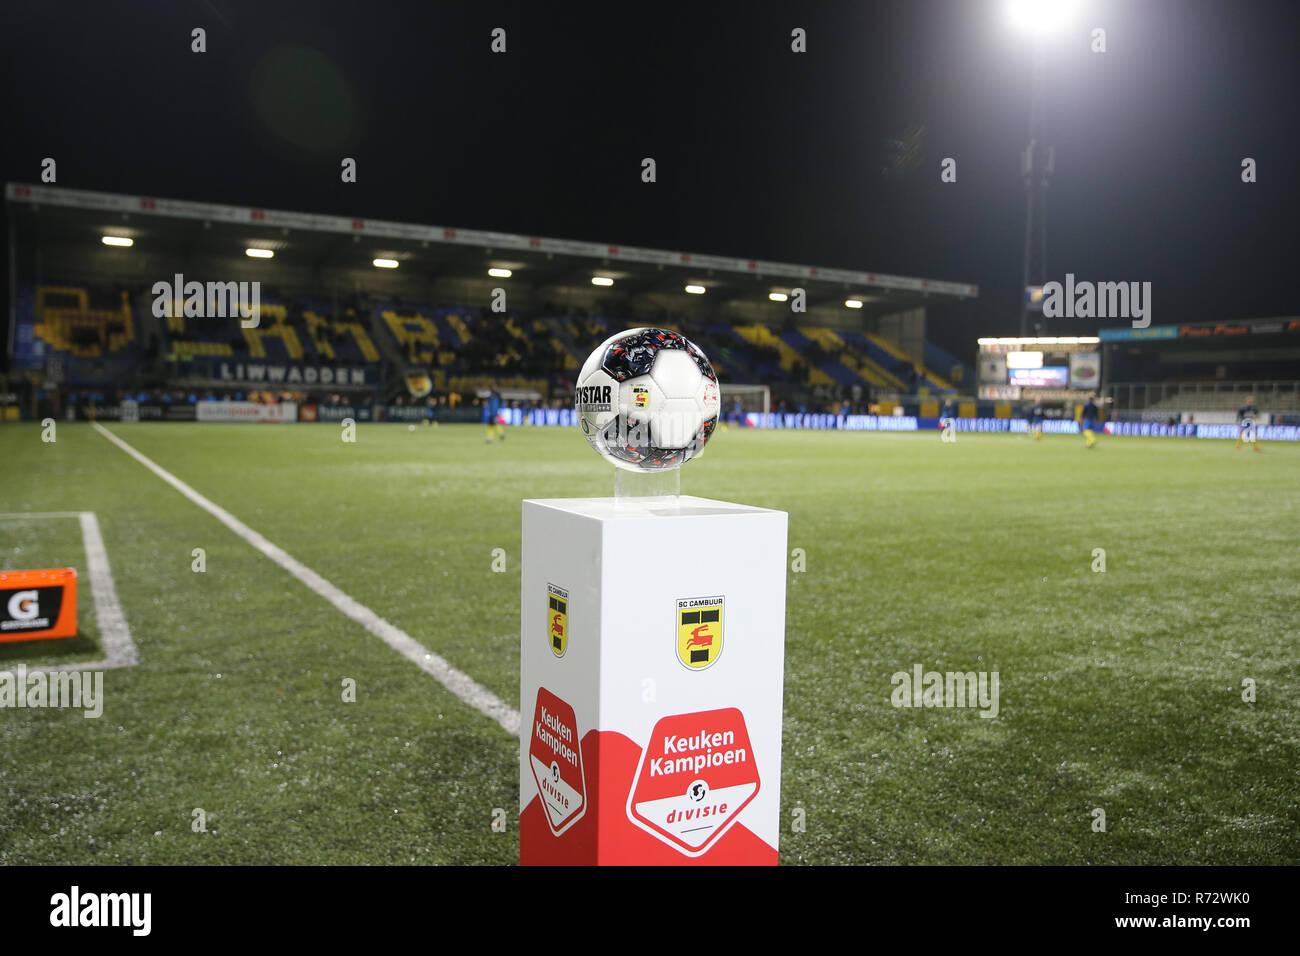 Keuken Kampioen Leeuwarden : Leeuwarden pays bas novembre dutch soccer keuken kampioen